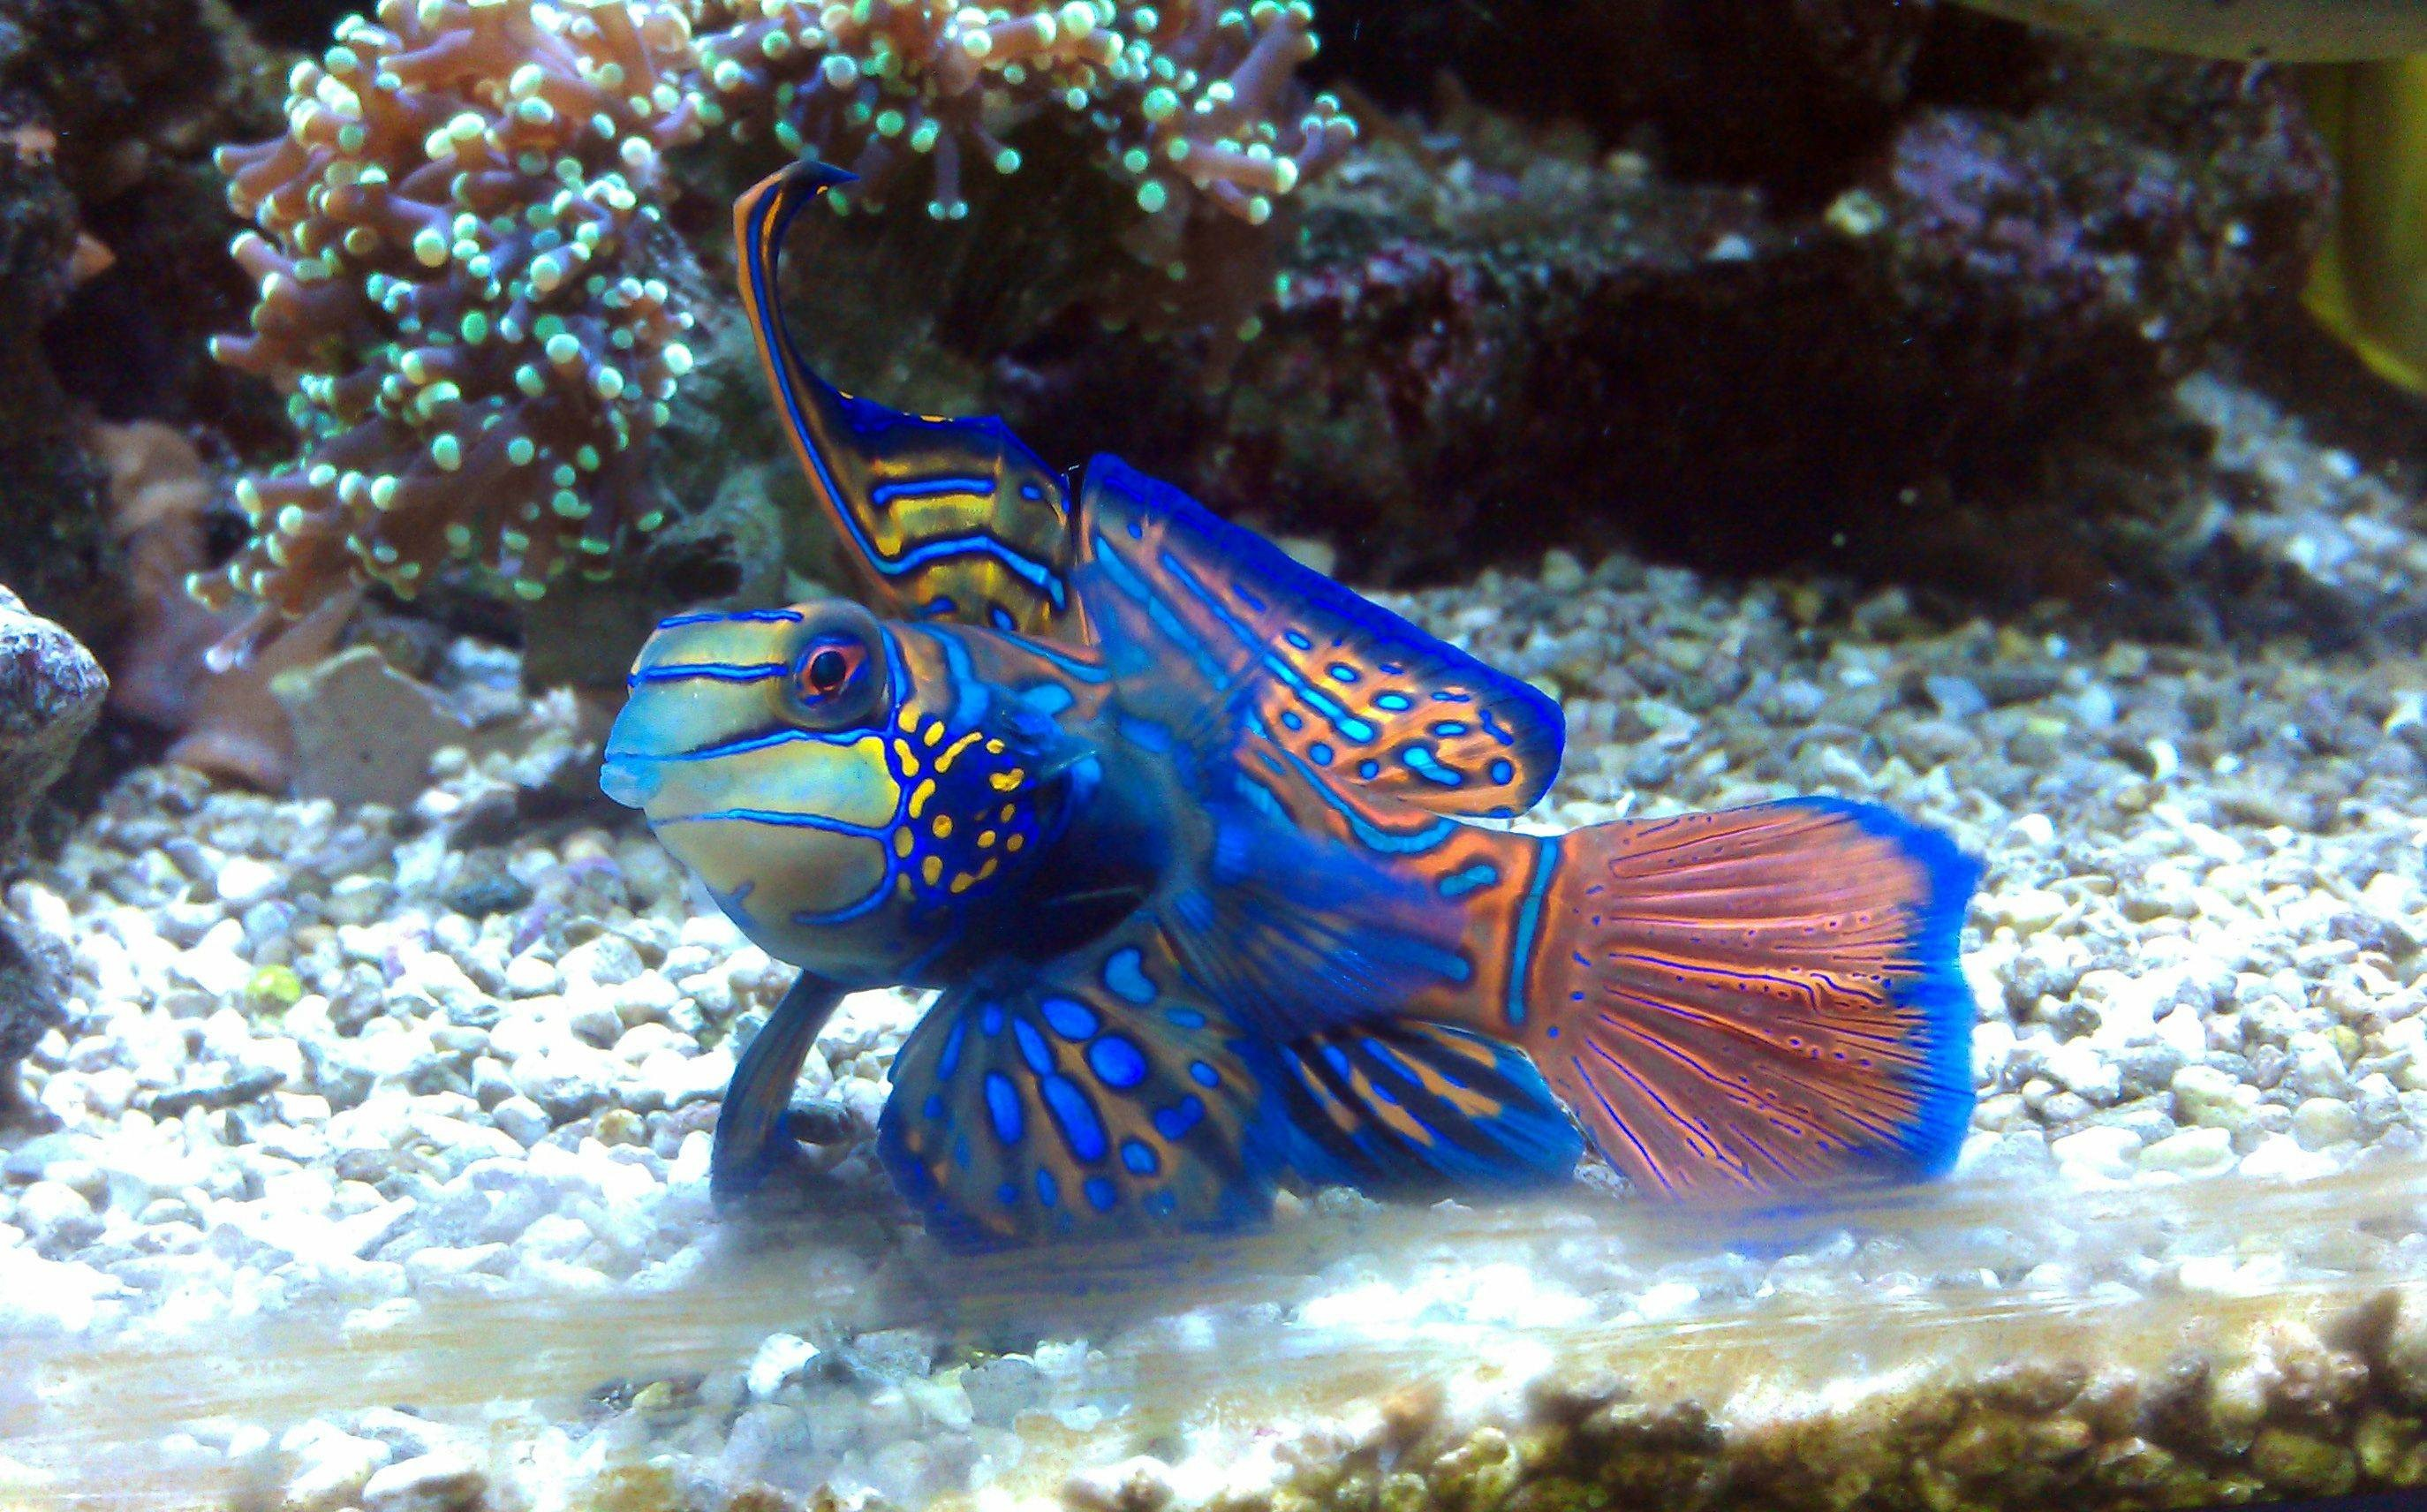 Res: 2748x1712, blue Saltwater Fish wallpaper